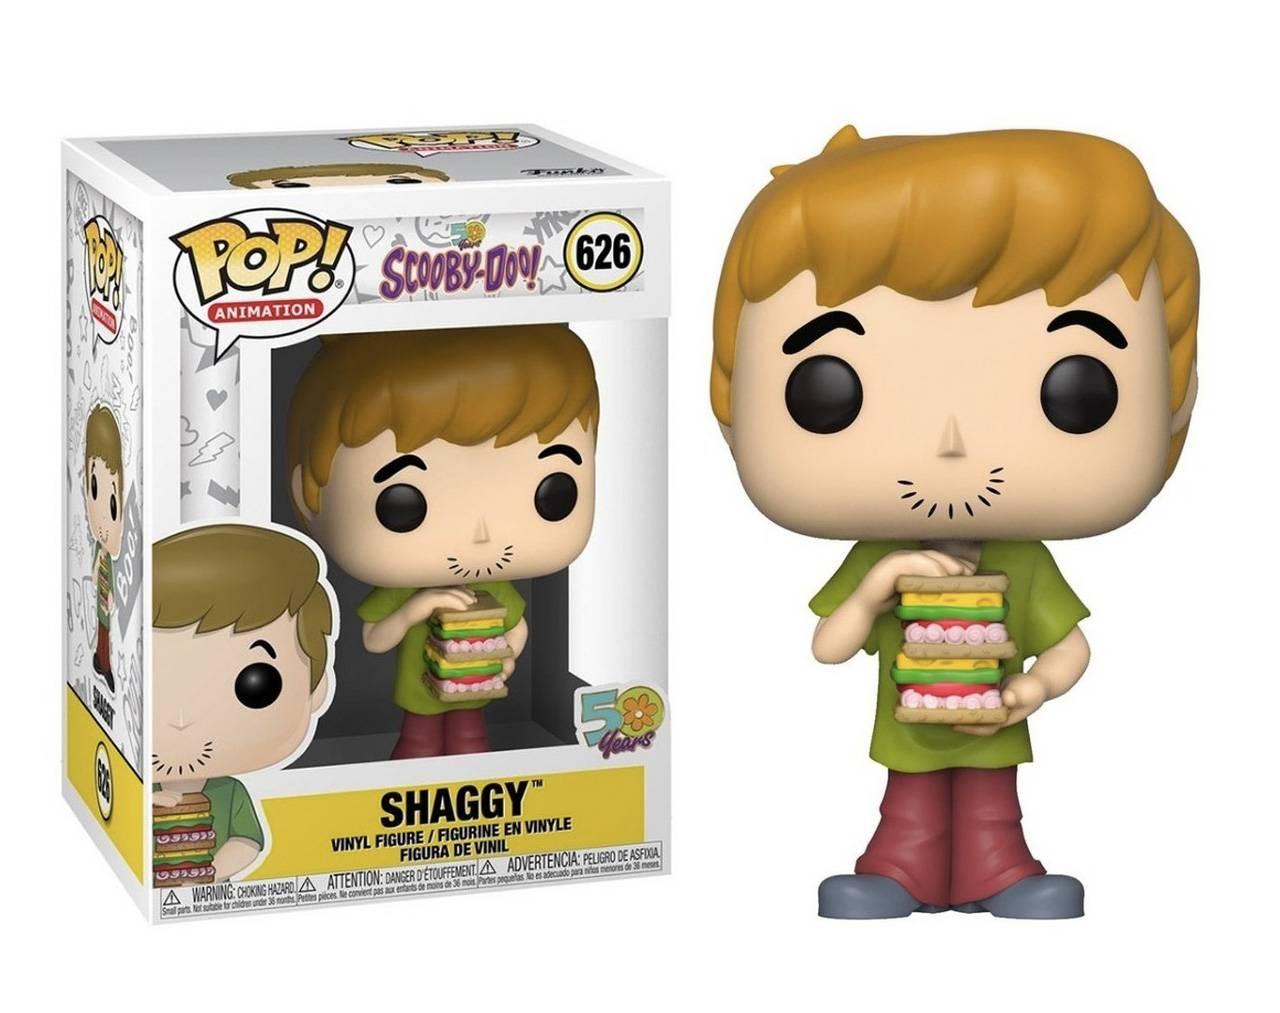 Shaggy (with Sandwich) Pop! Vinyl